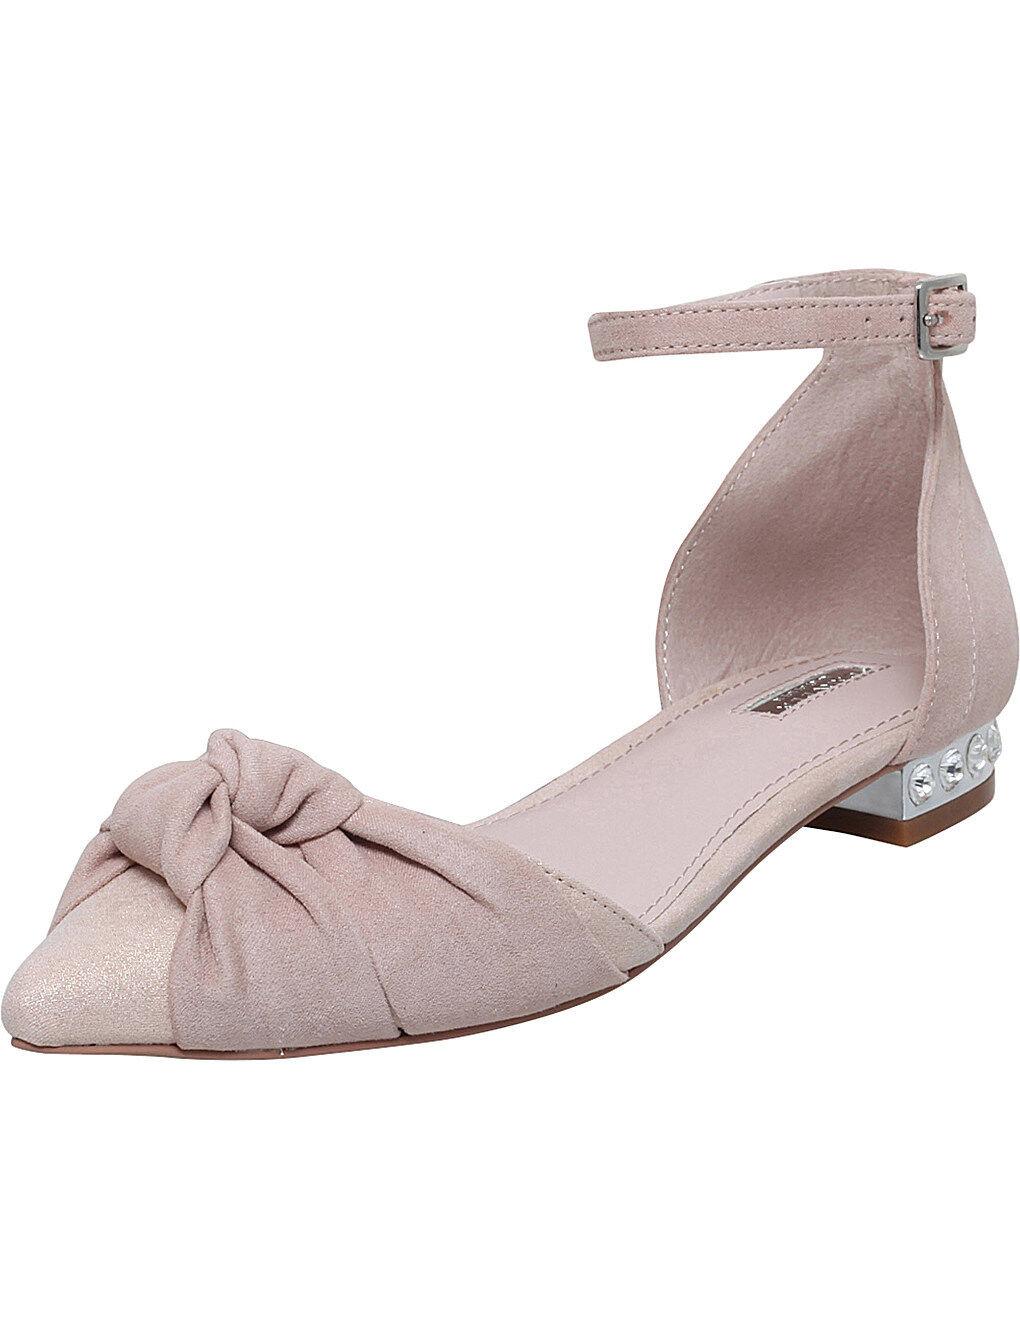 CARVELA Leah Faux Suede Flats Pink   UK UK UK 5 EU 38 LN077 KK 01 SALEs 399530